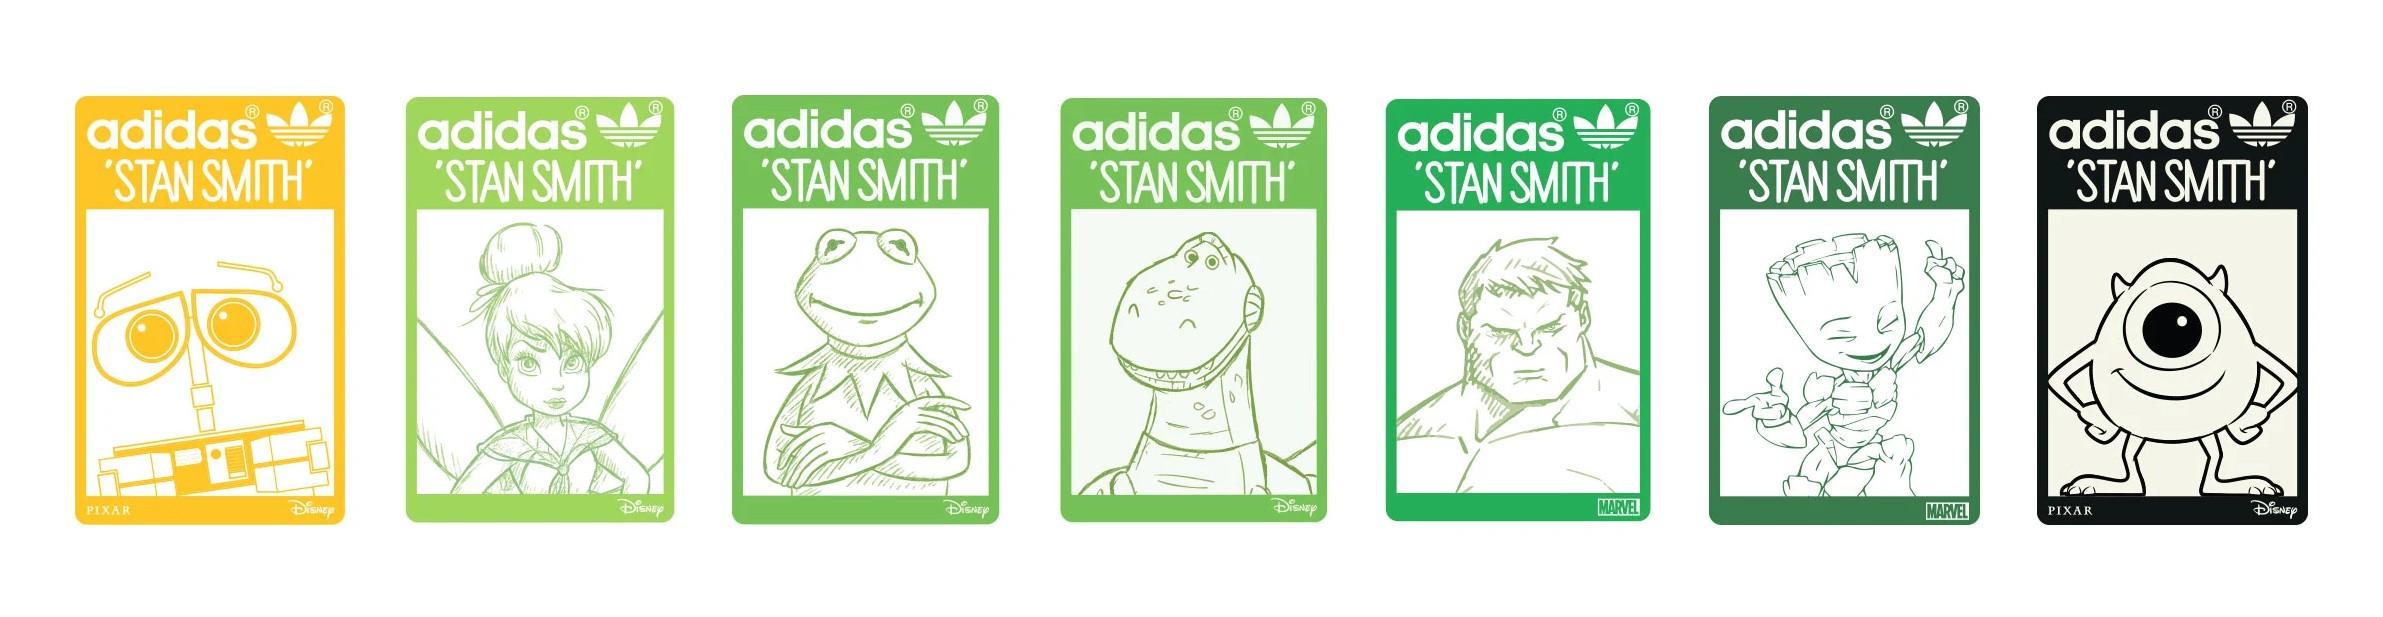 adidas x disney x pixar x marvel - stan smith collection release date